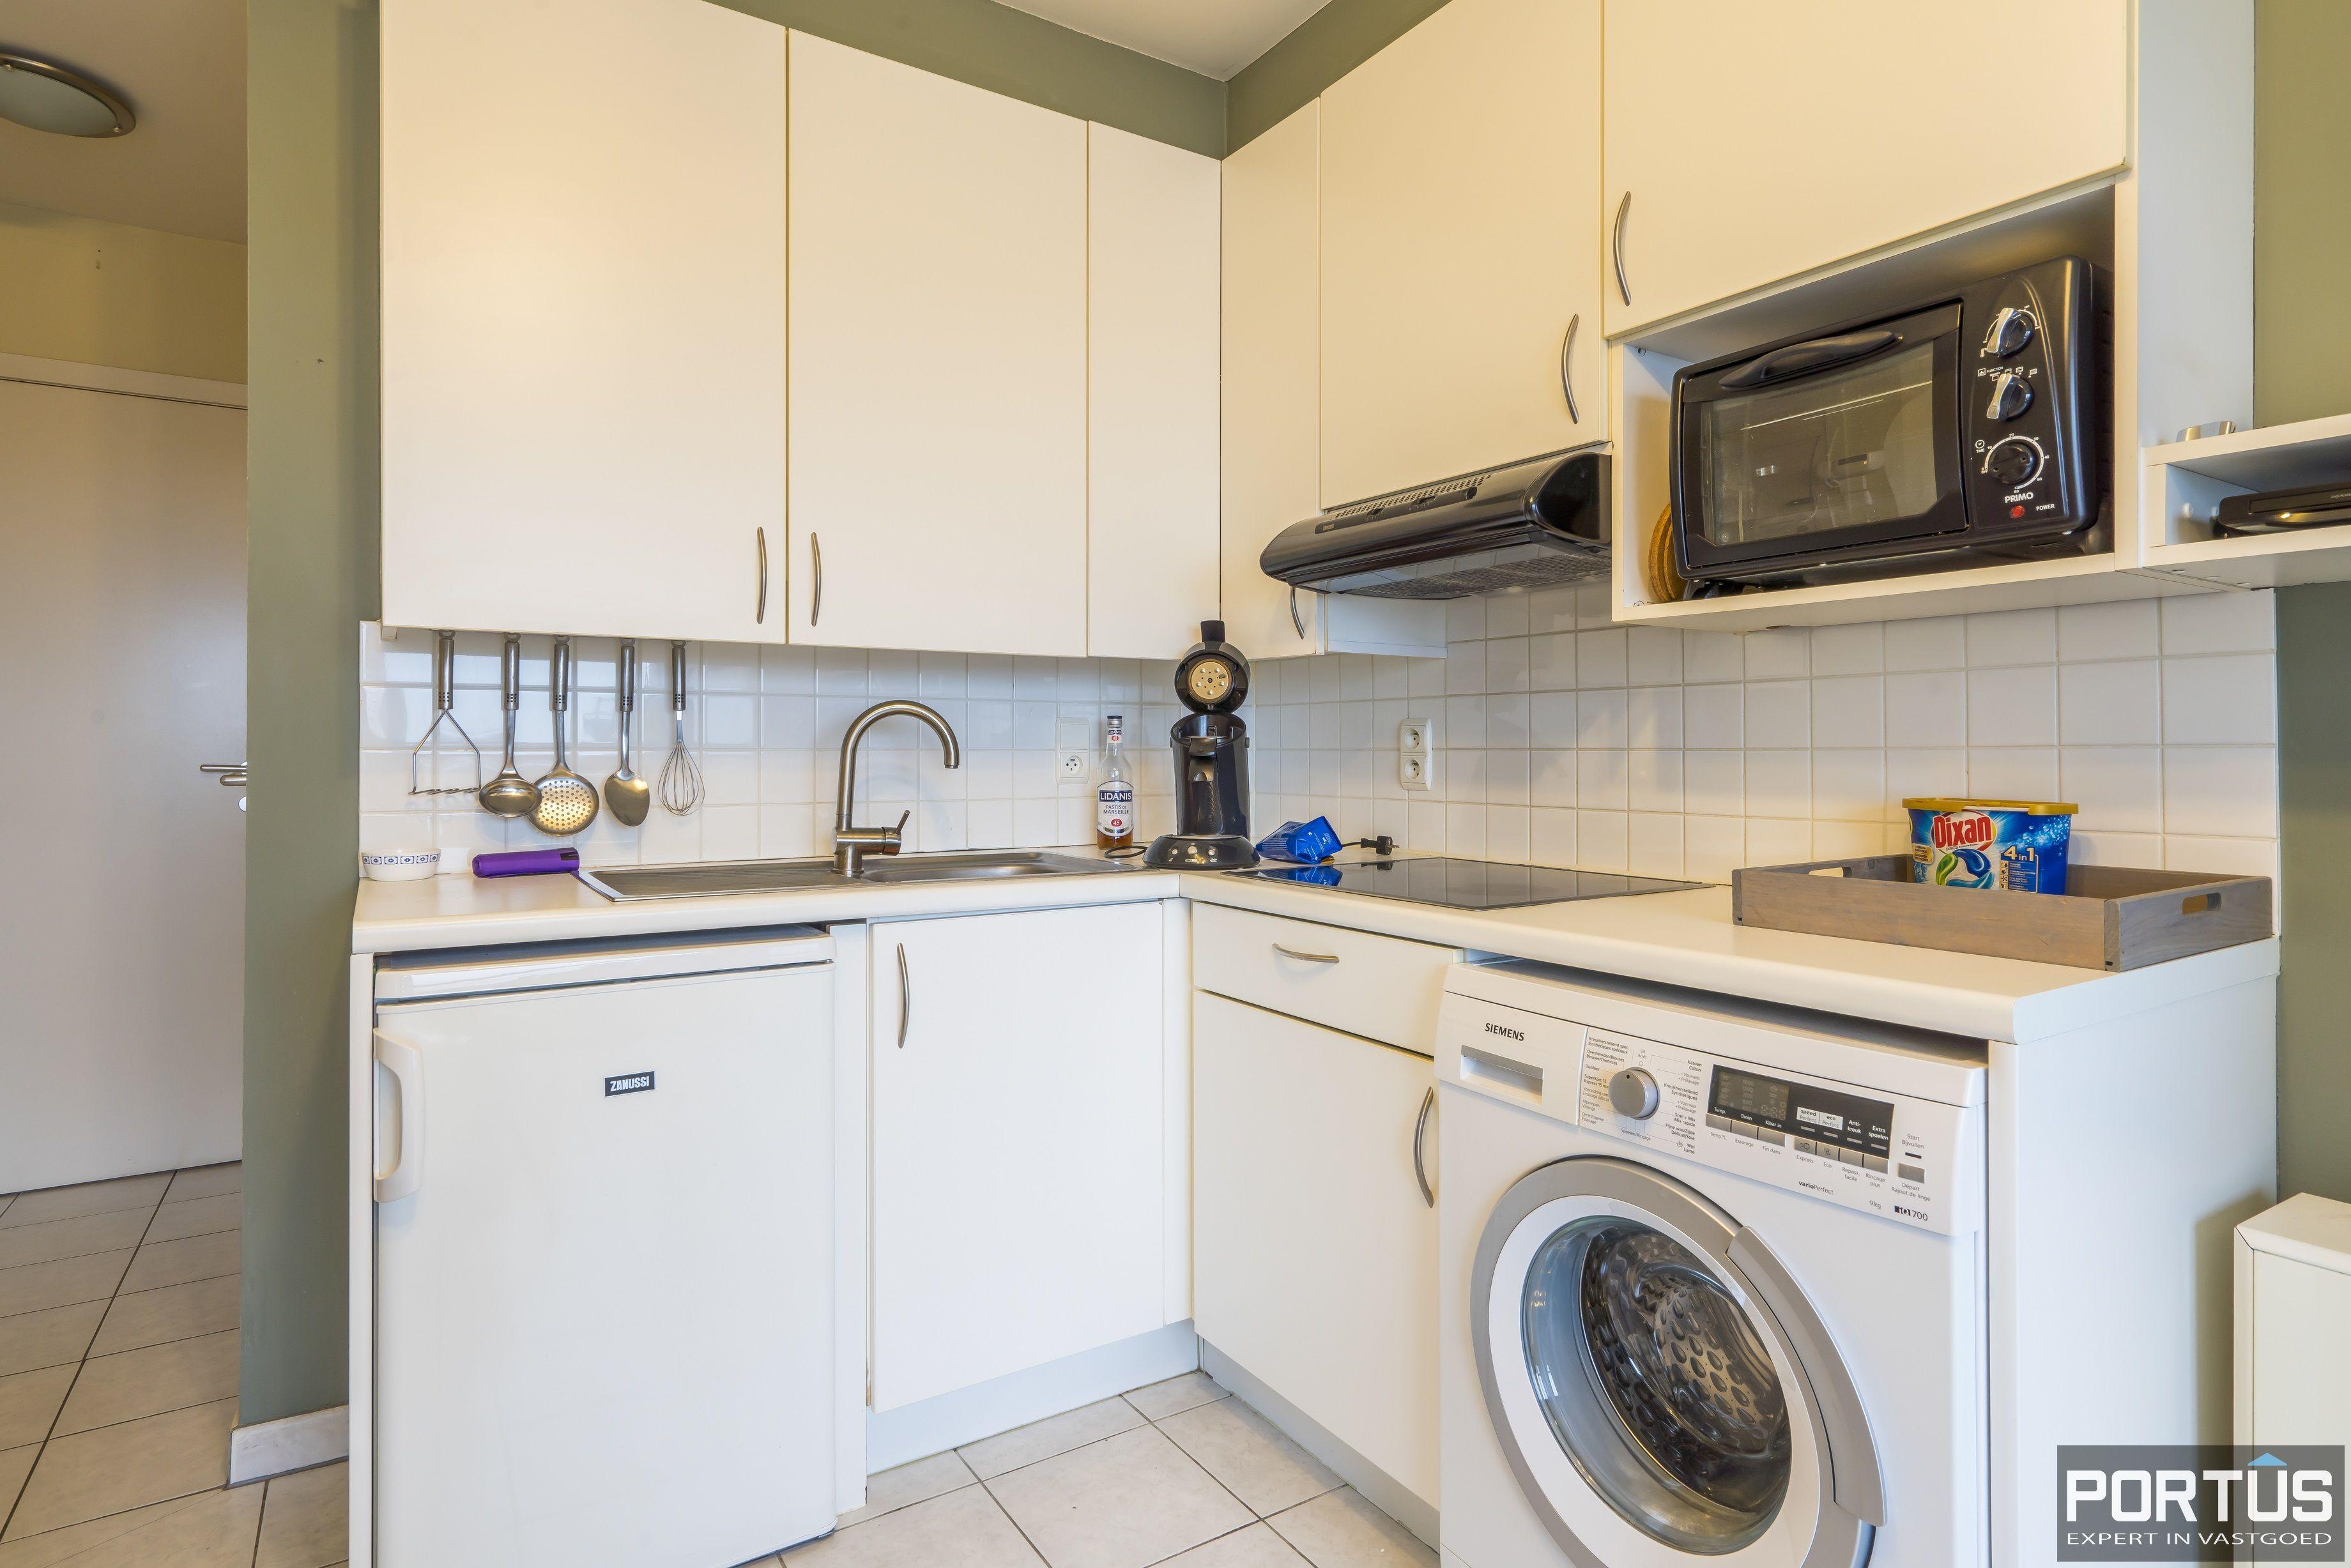 Instapklaar appartement met 1 slaapkamer te koop te Westende - 12043